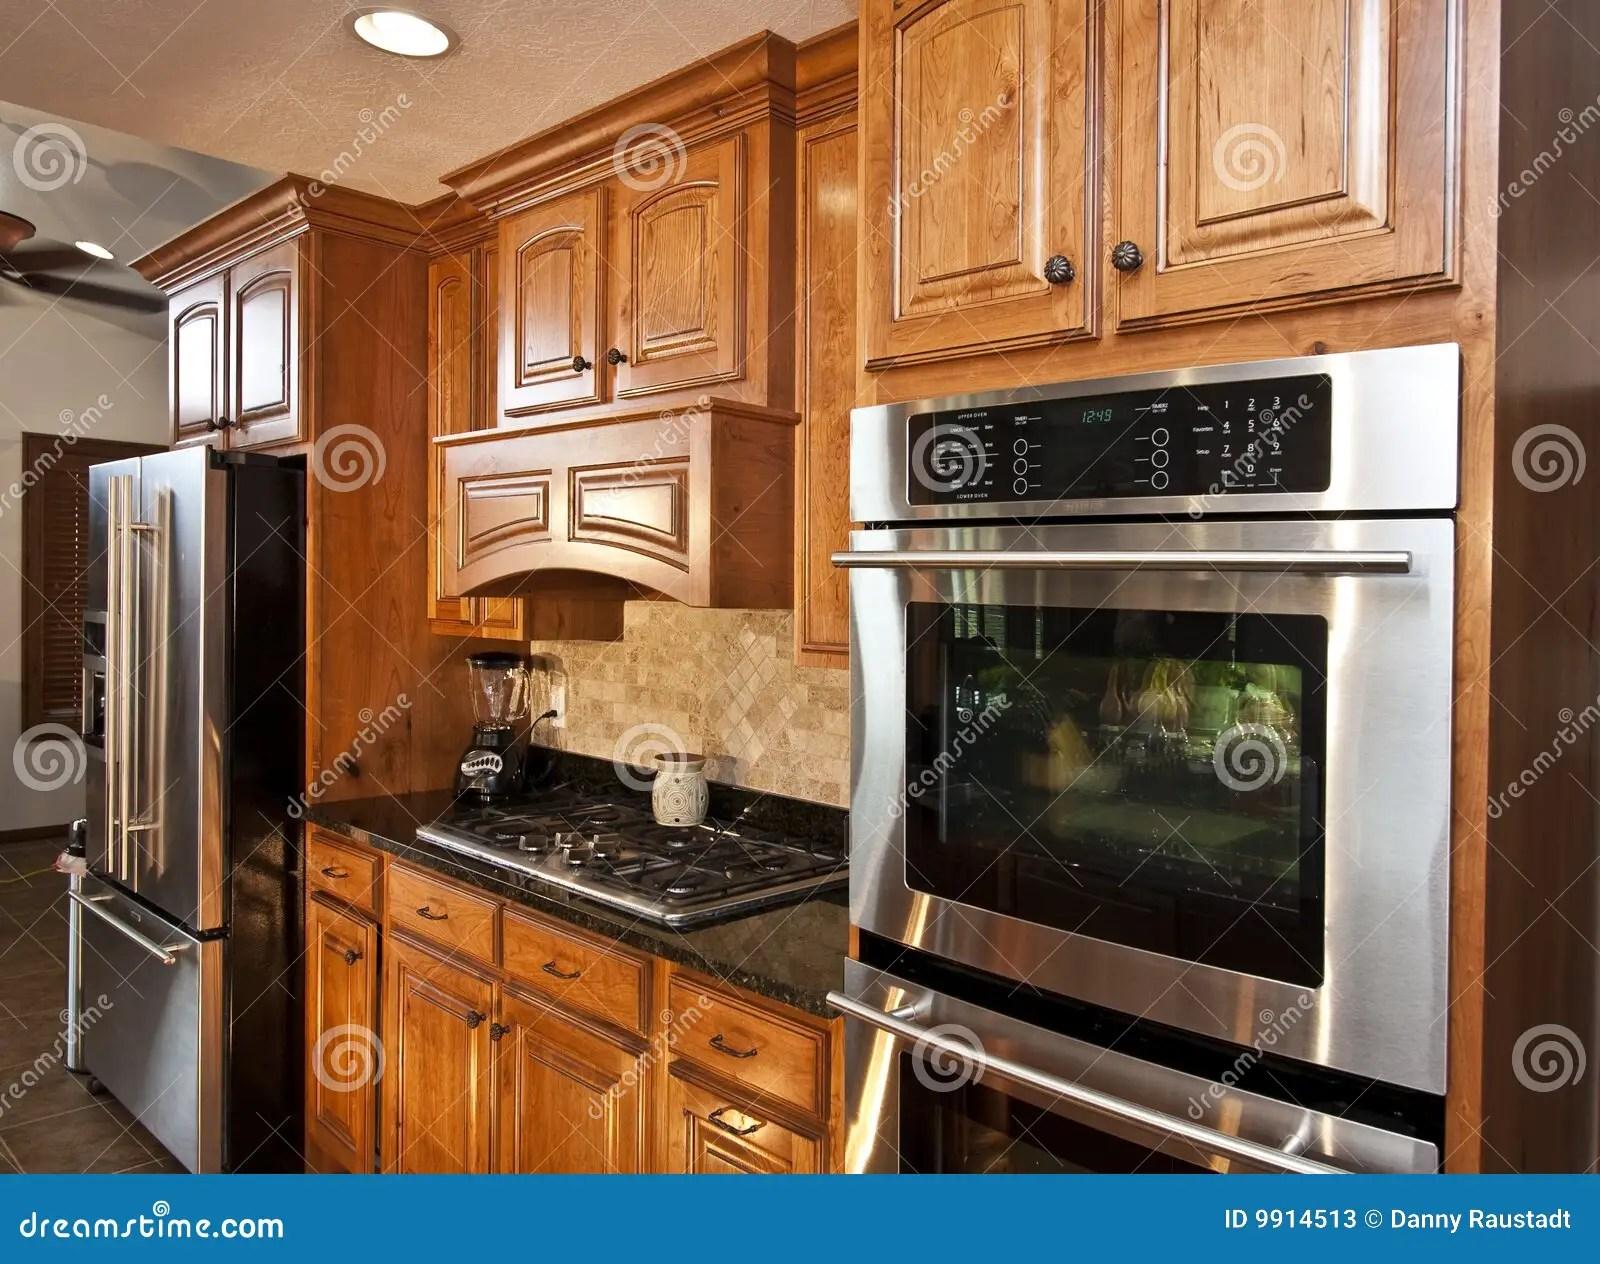 new kitchen appliances lights under cabinets modern stove